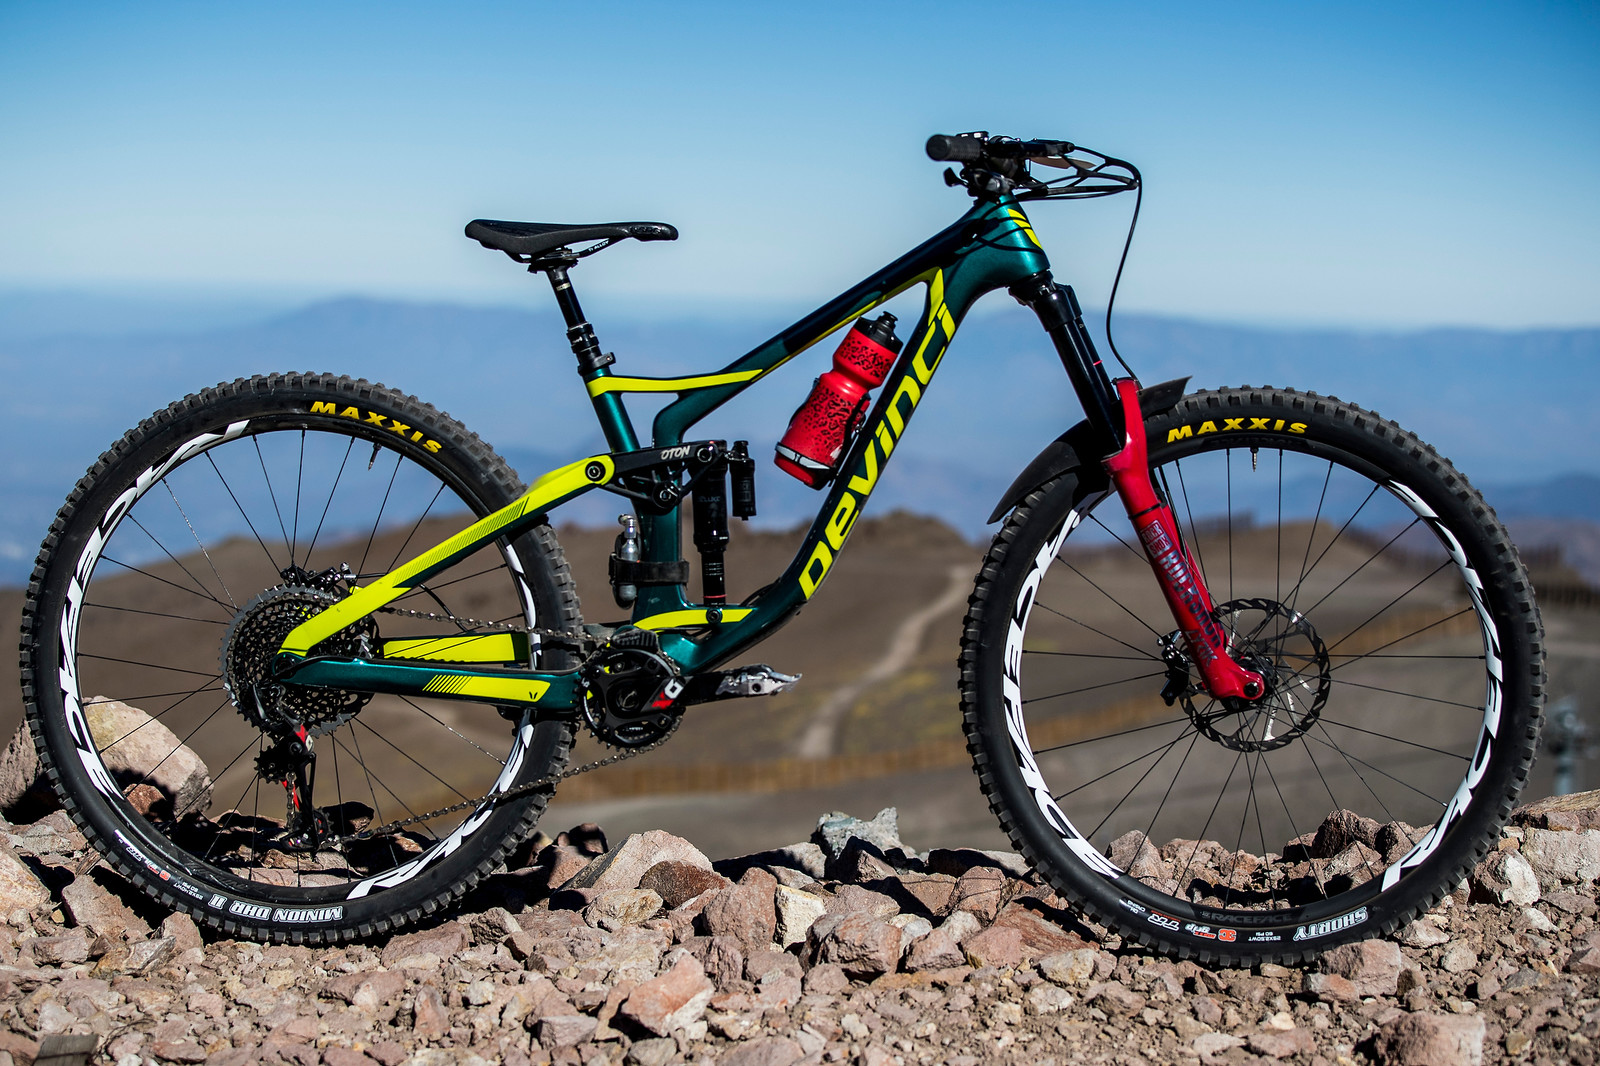 Damien Oton's Prototype Devinci Spartan 29 at the 2018 La Parva EWS - PIT BITS AND BIKES - Enduro World Series, Chile - Mountain Biking Pictures - Vital MTB